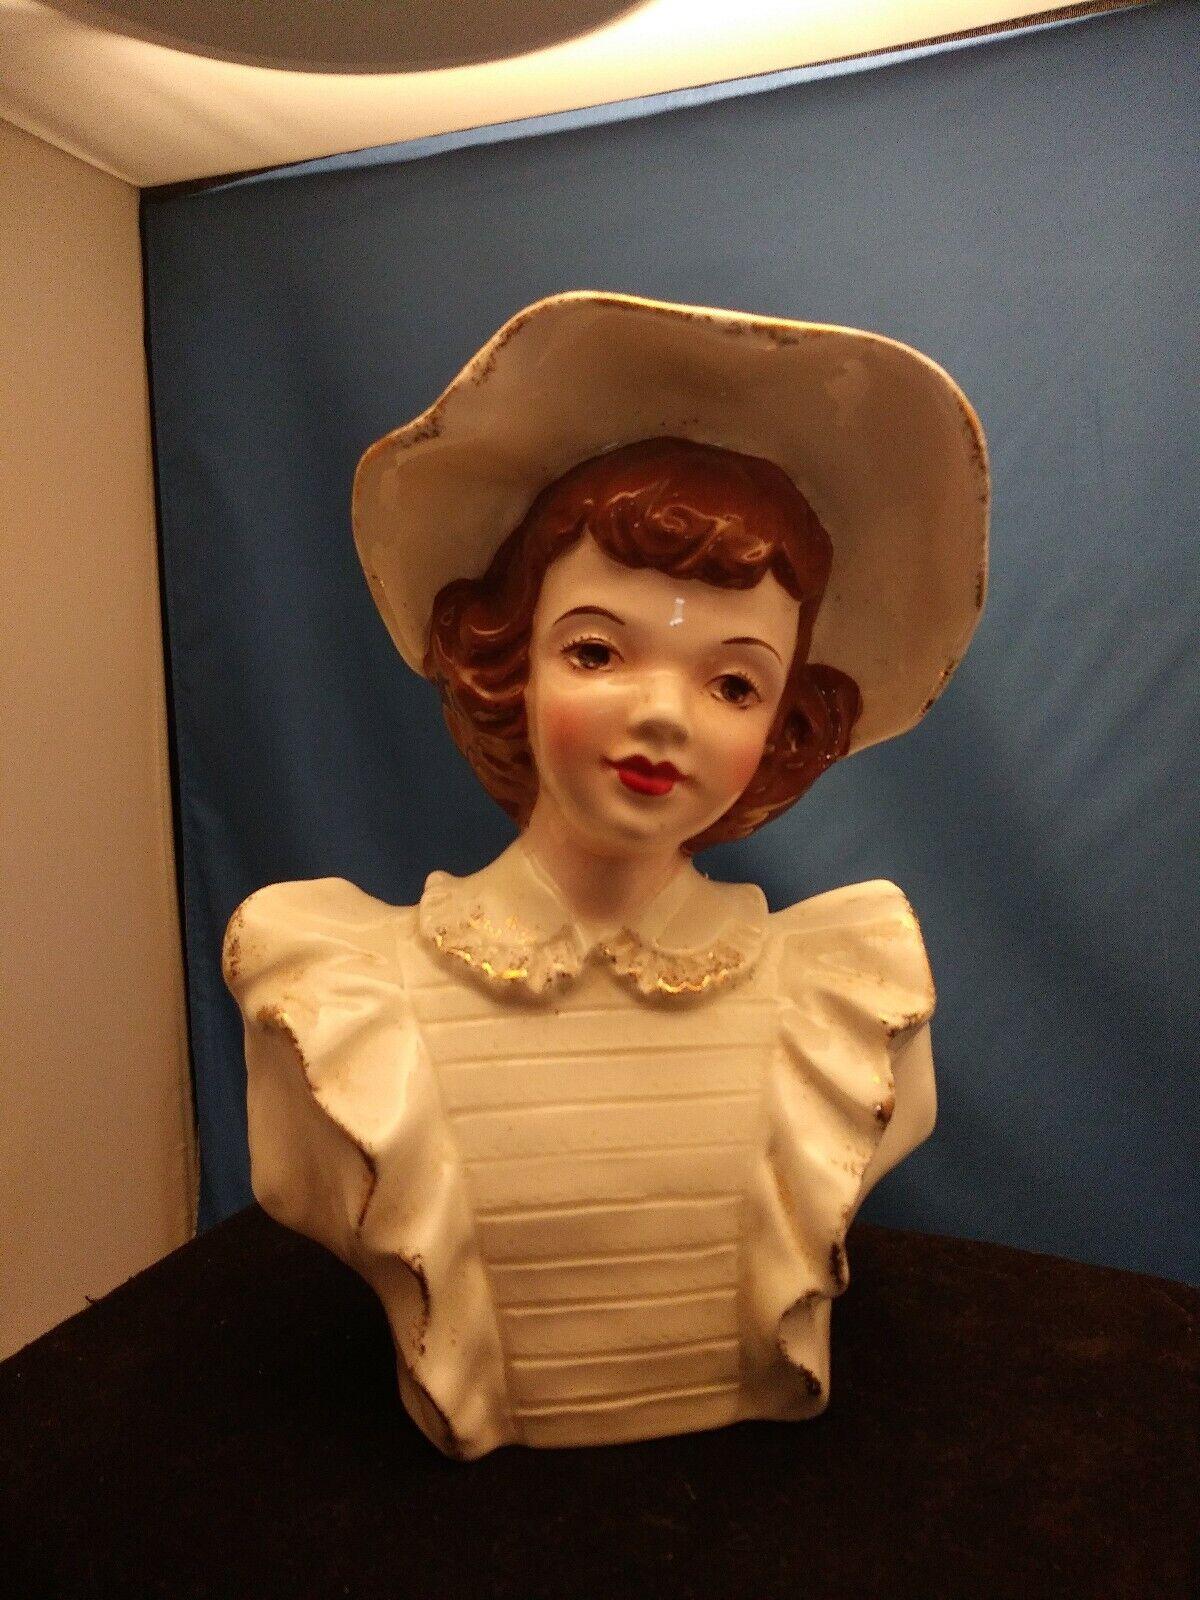 autentico online Vintage Vintage Vintage Ceramic Lady bambola Head with bianca hat Vase Planter 6  TtuttiESTATE SALE  compra nuovo economico